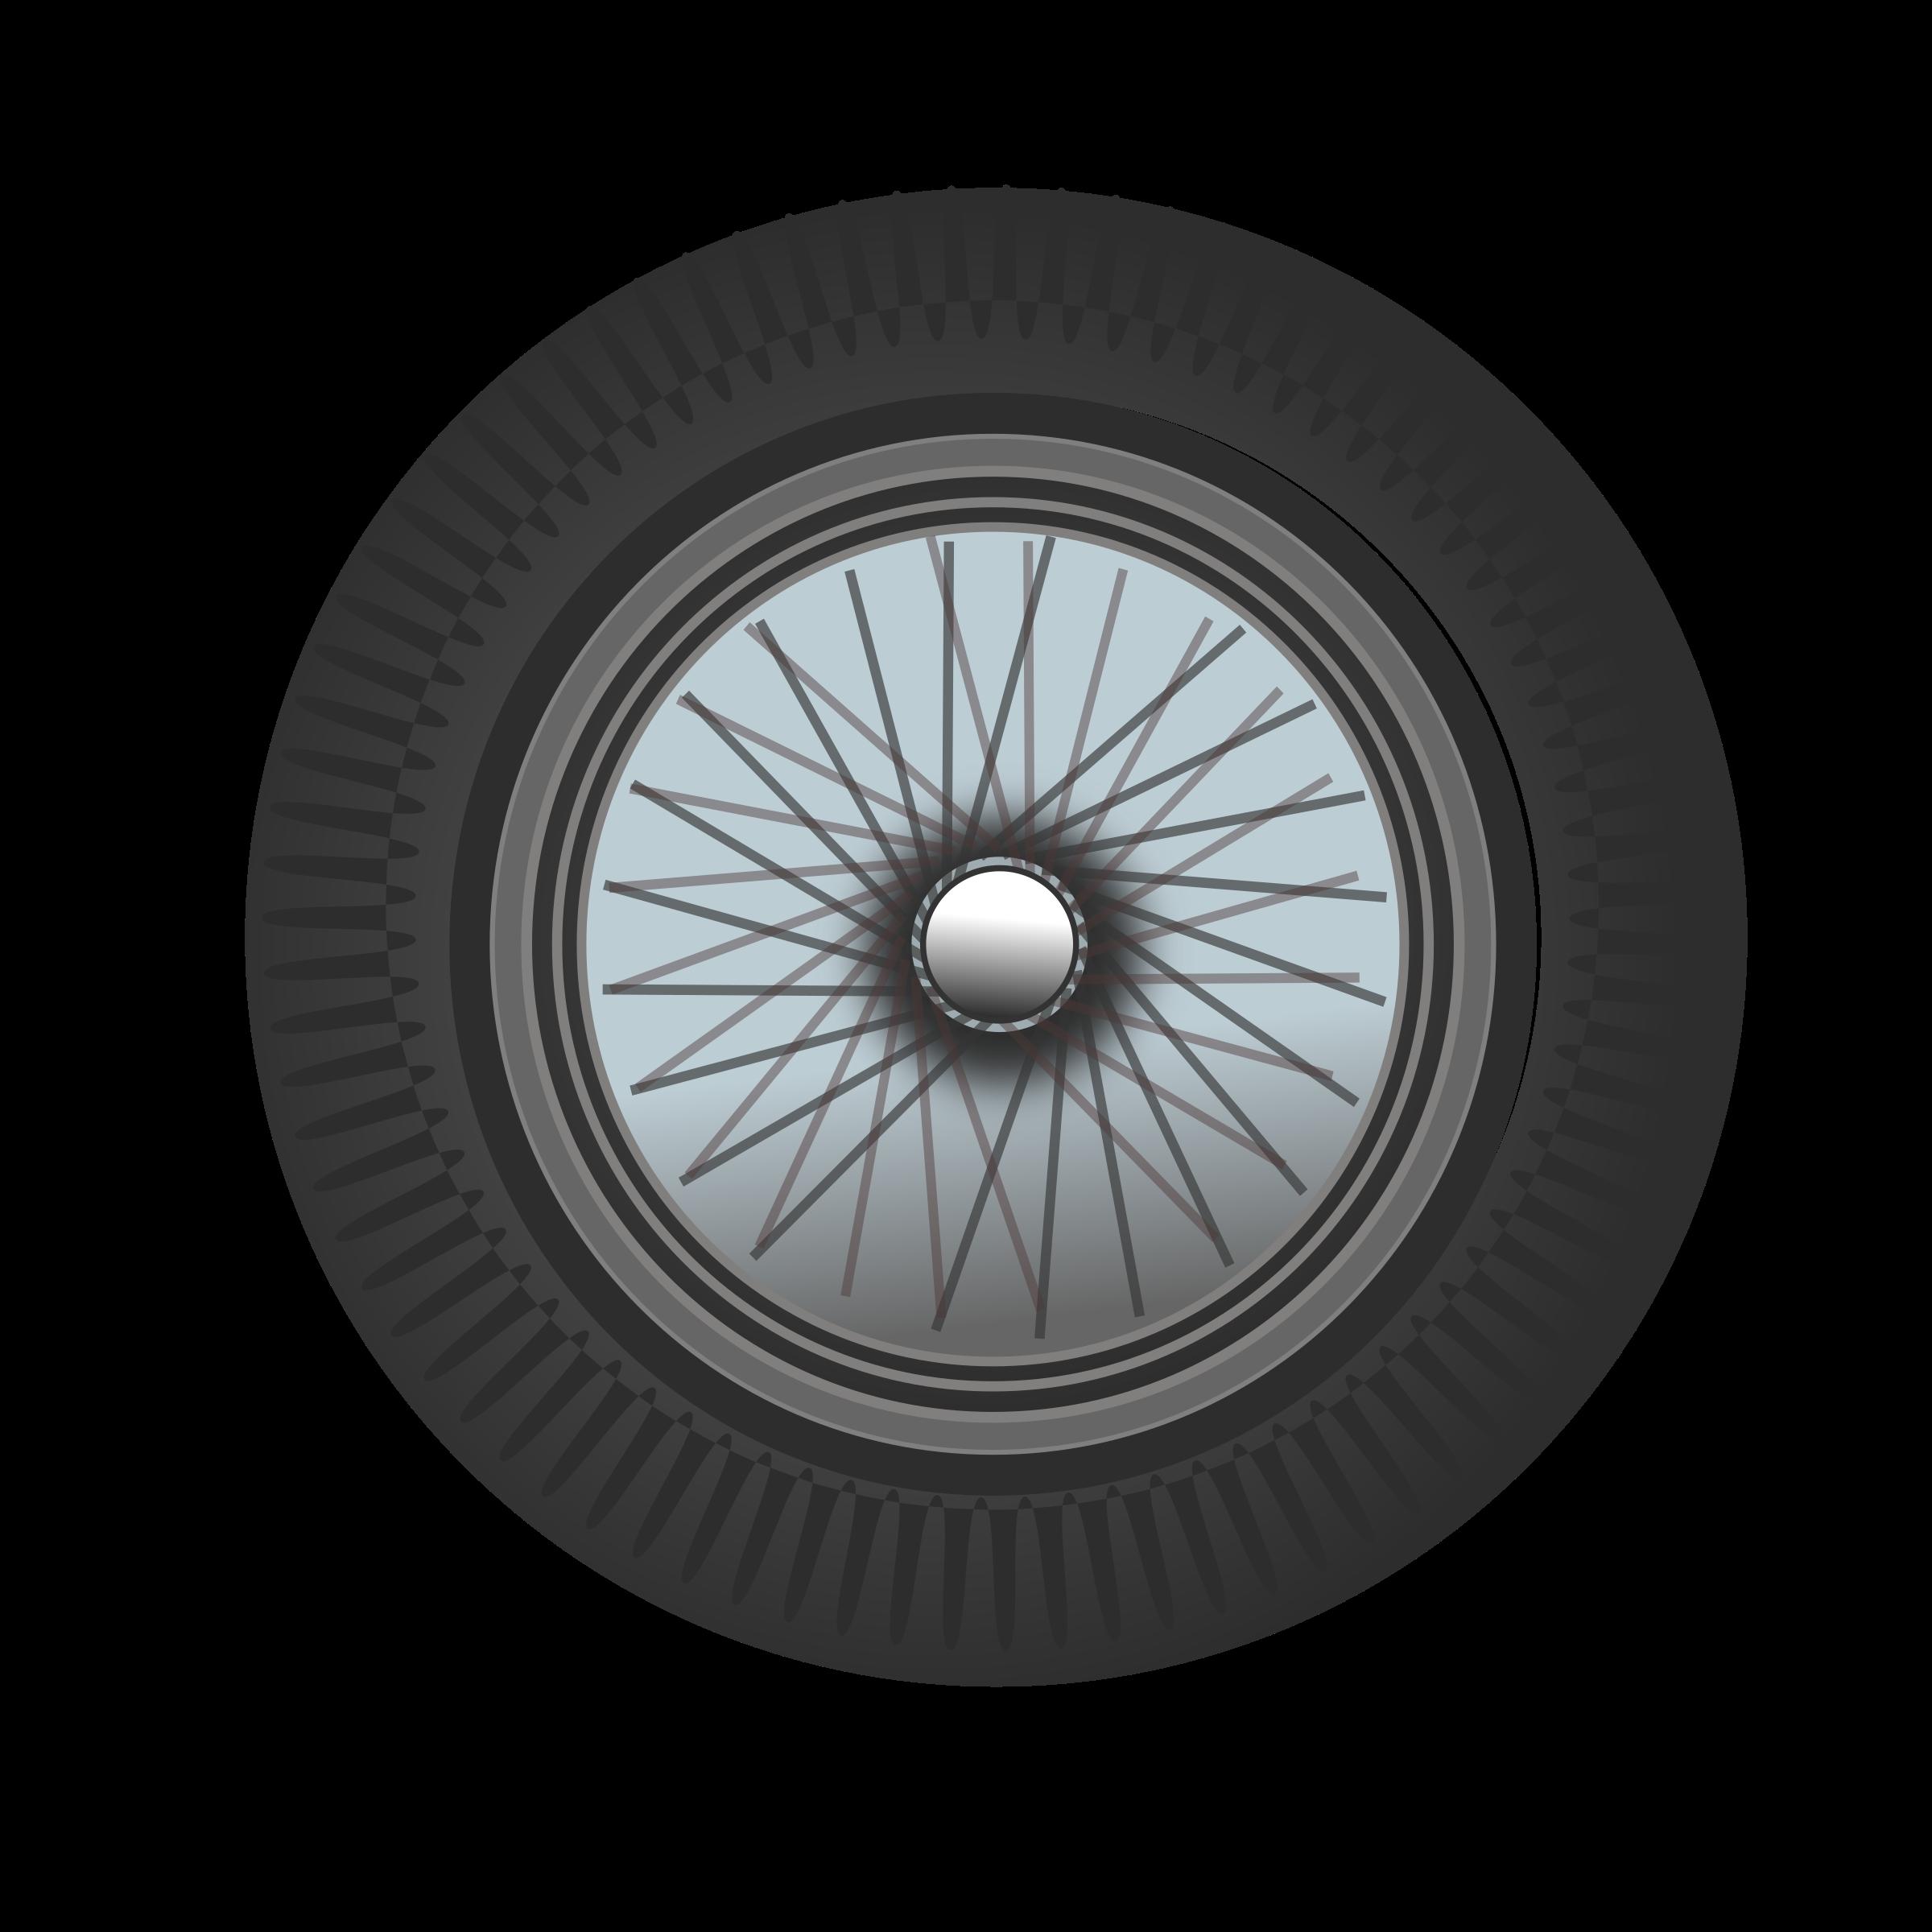 Film clipart wheel. Classic car big image